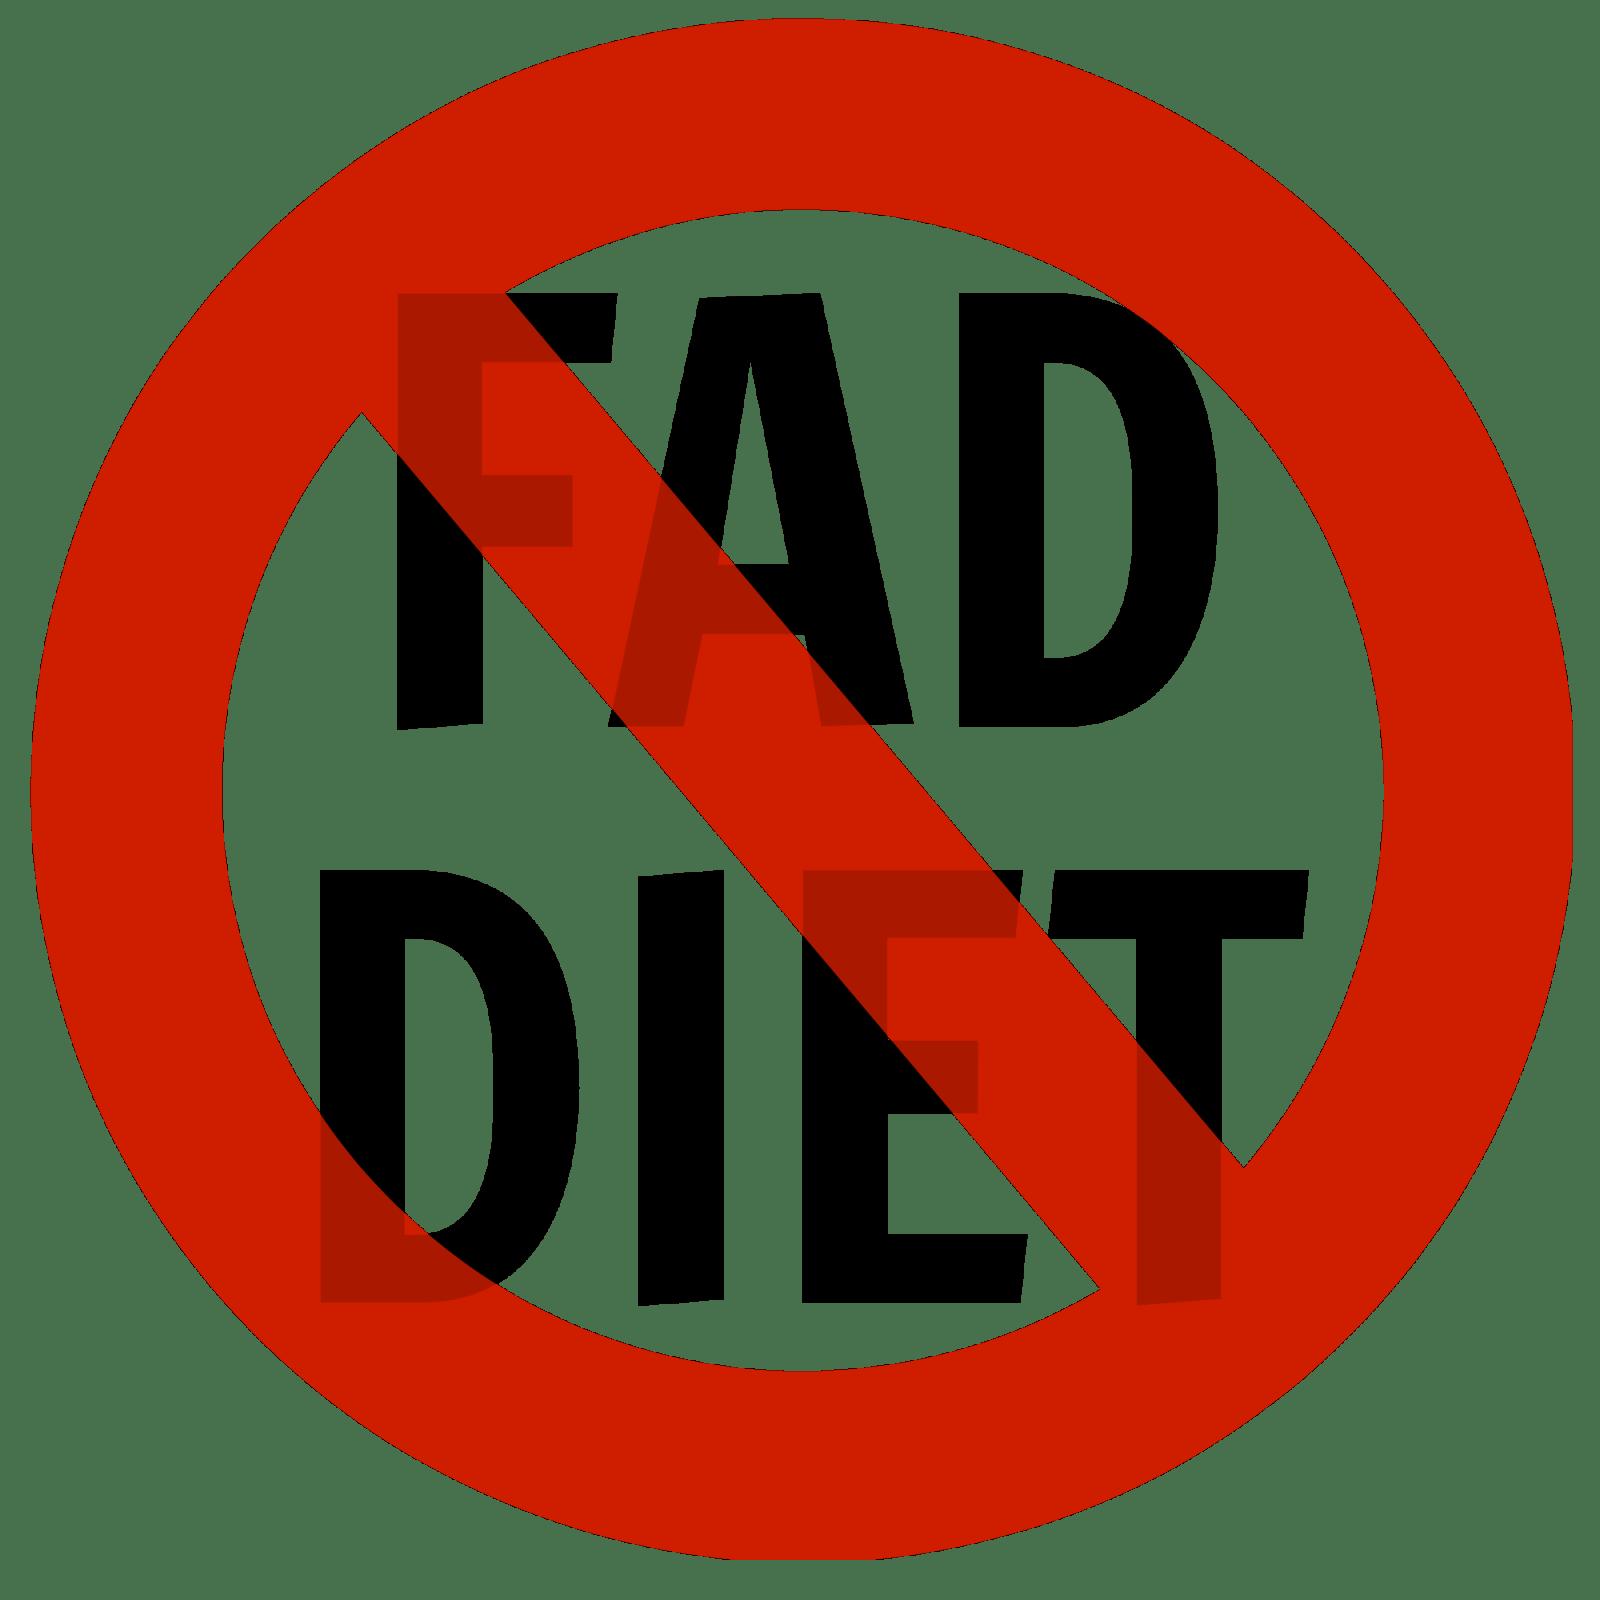 fad-diet